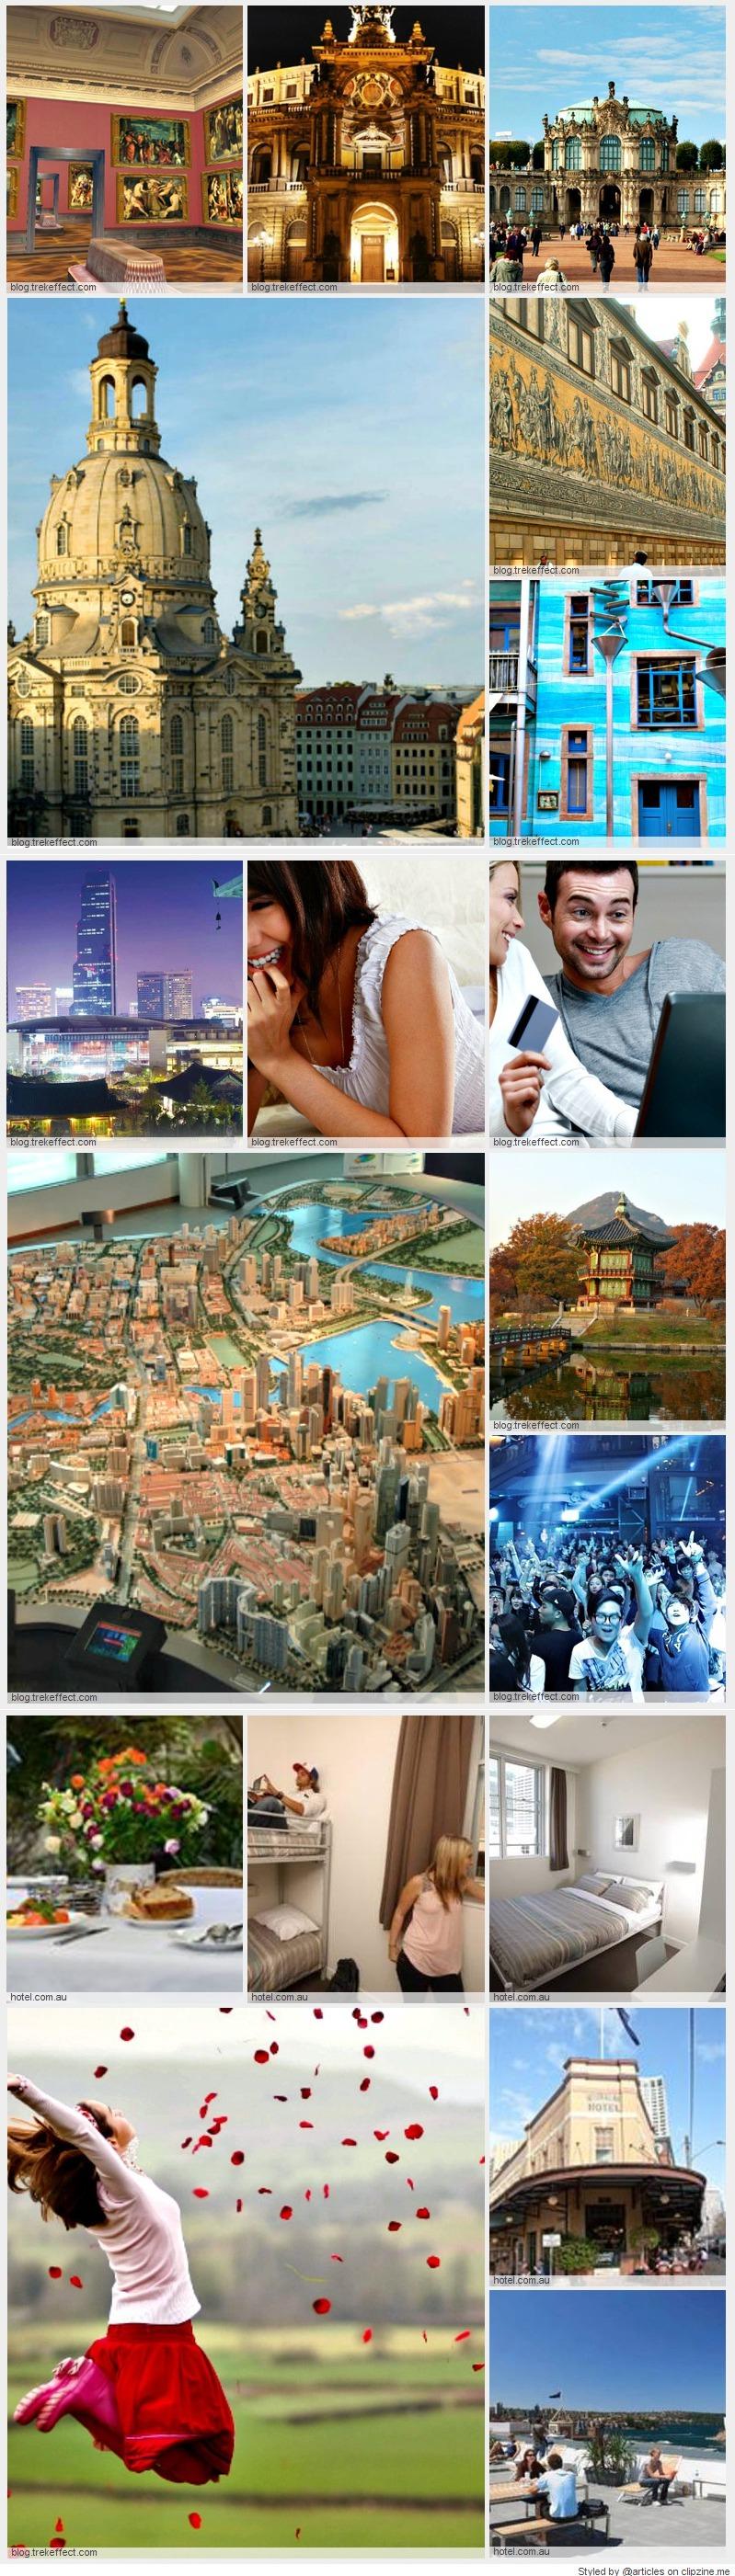 #Viagem. Travel Planner and Guide